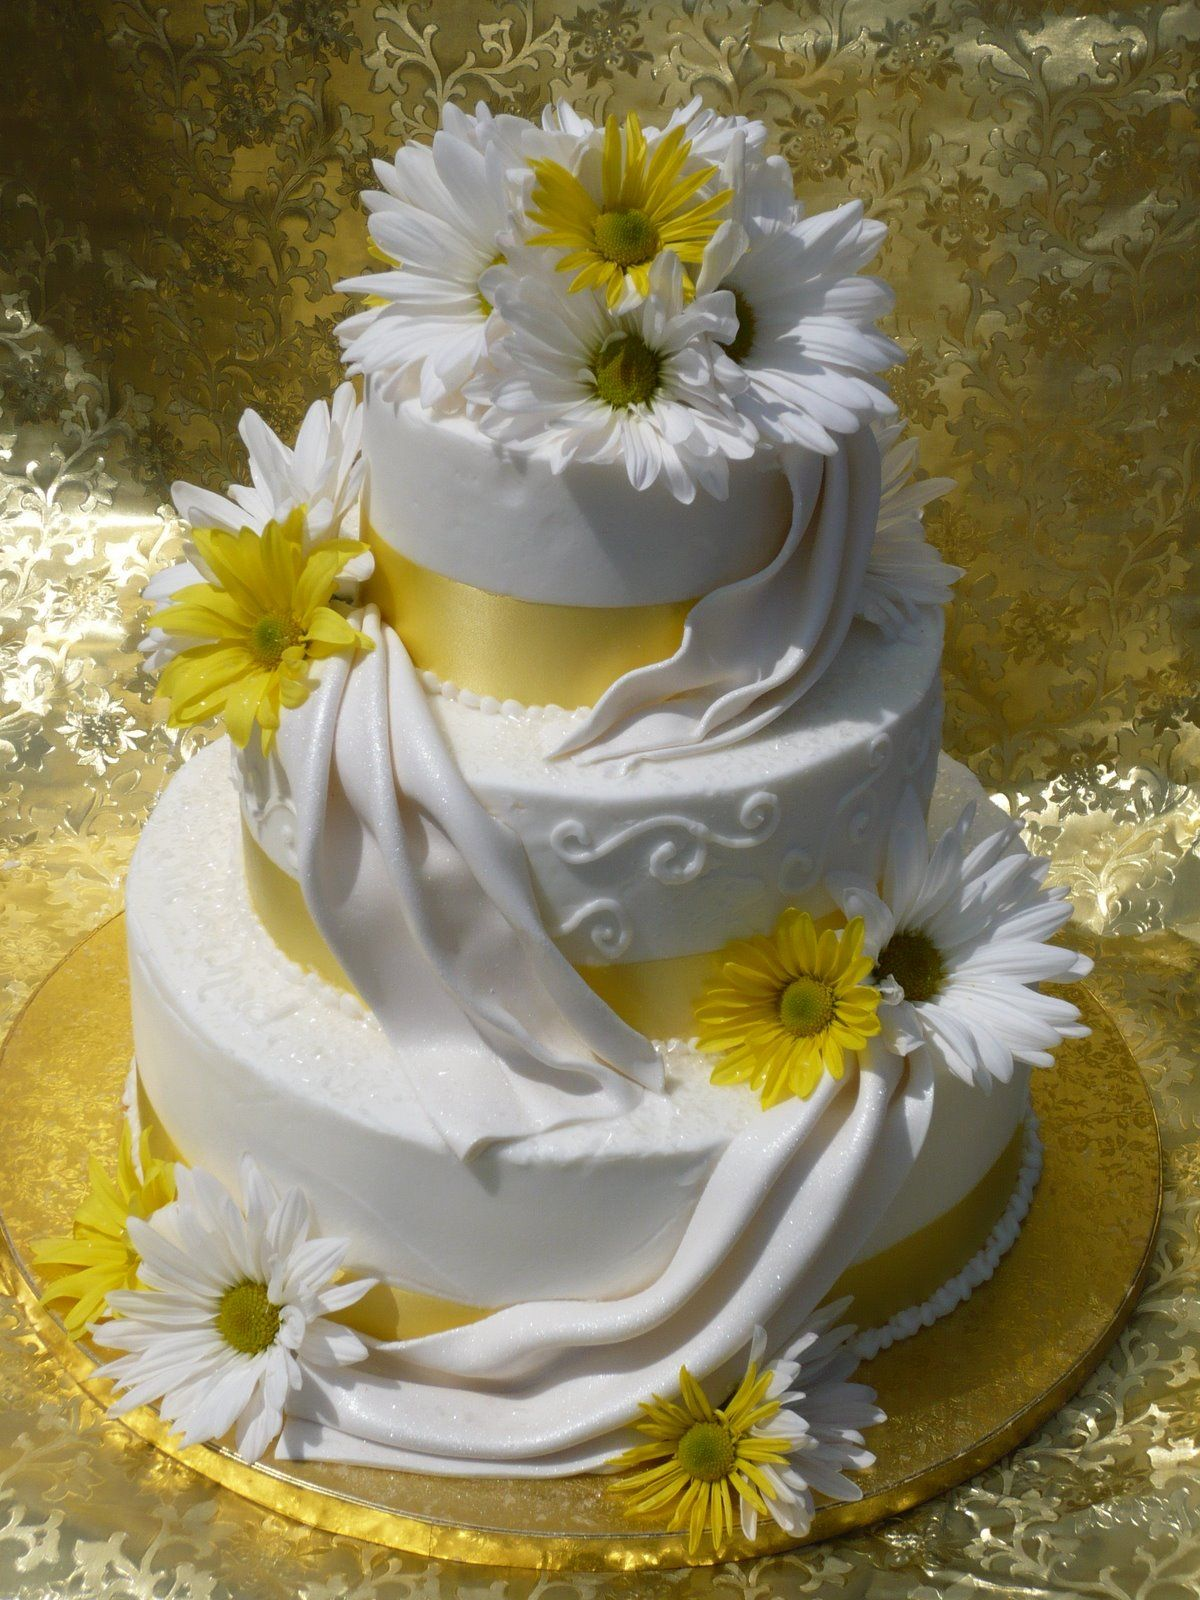 daisy and burlap wedding cakes | Spring Weddings « CLH Weddings